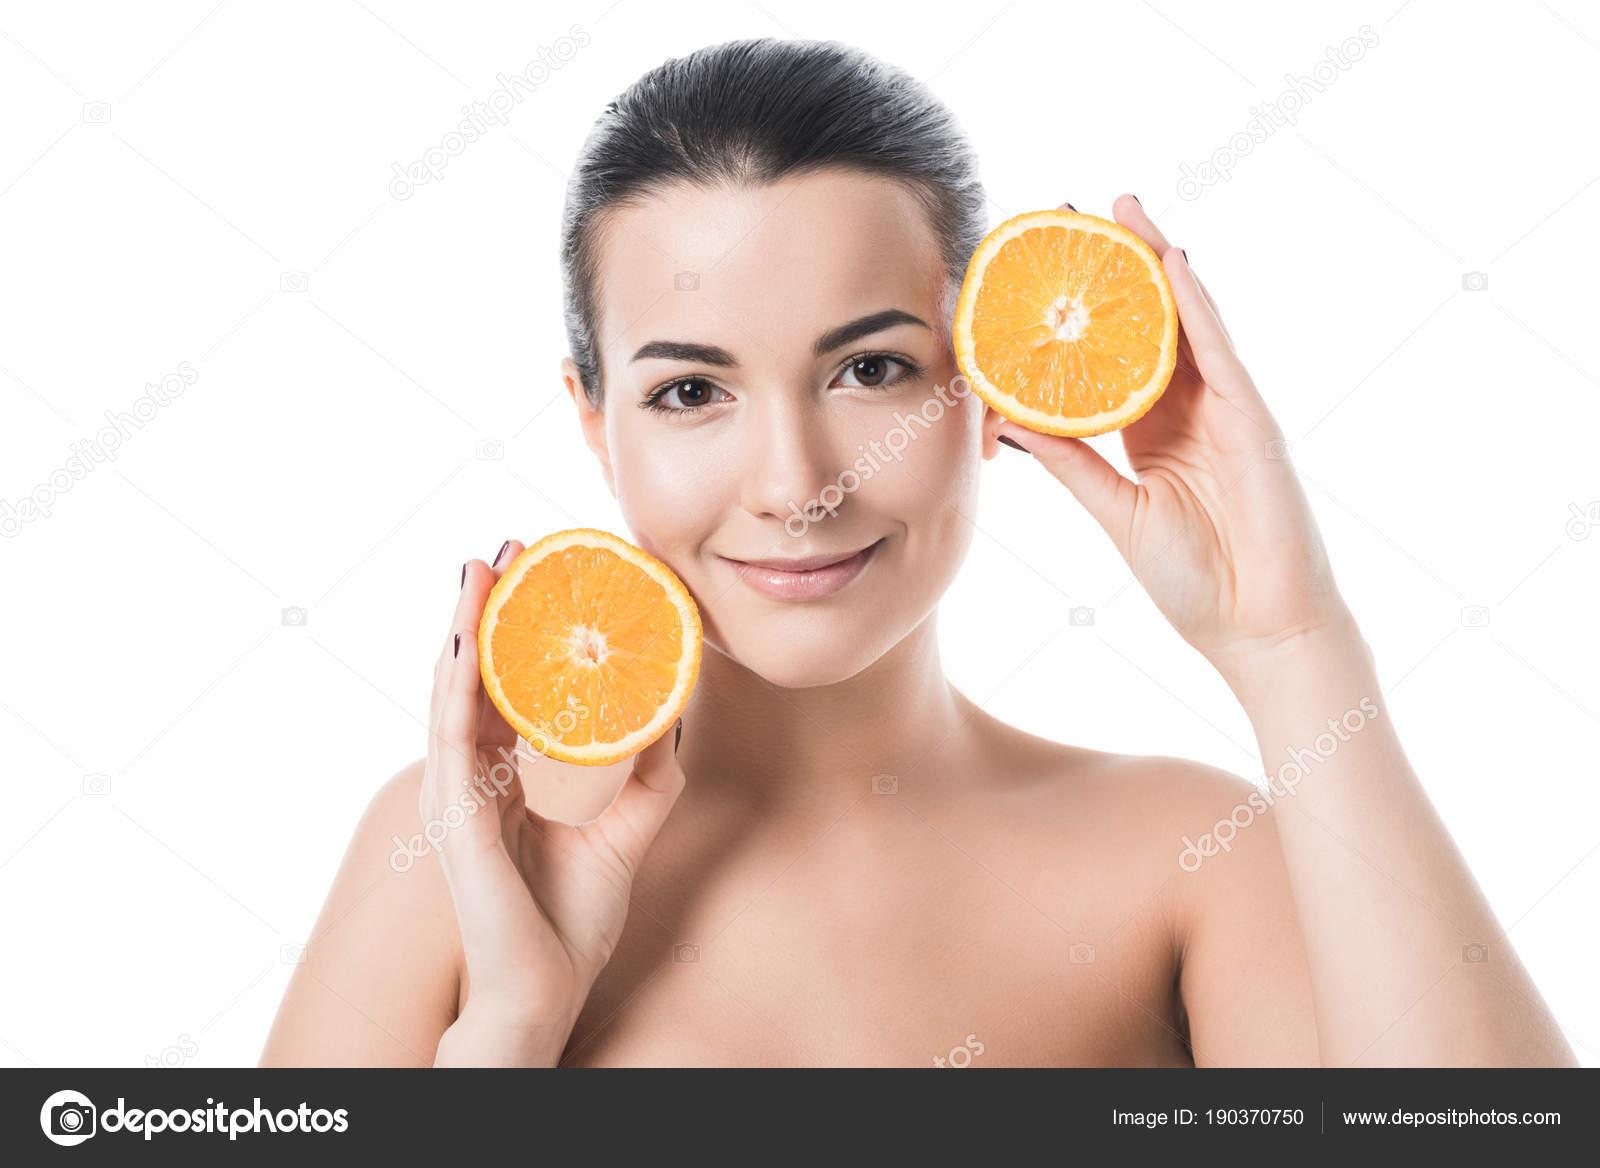 Fruit look like naked girl think